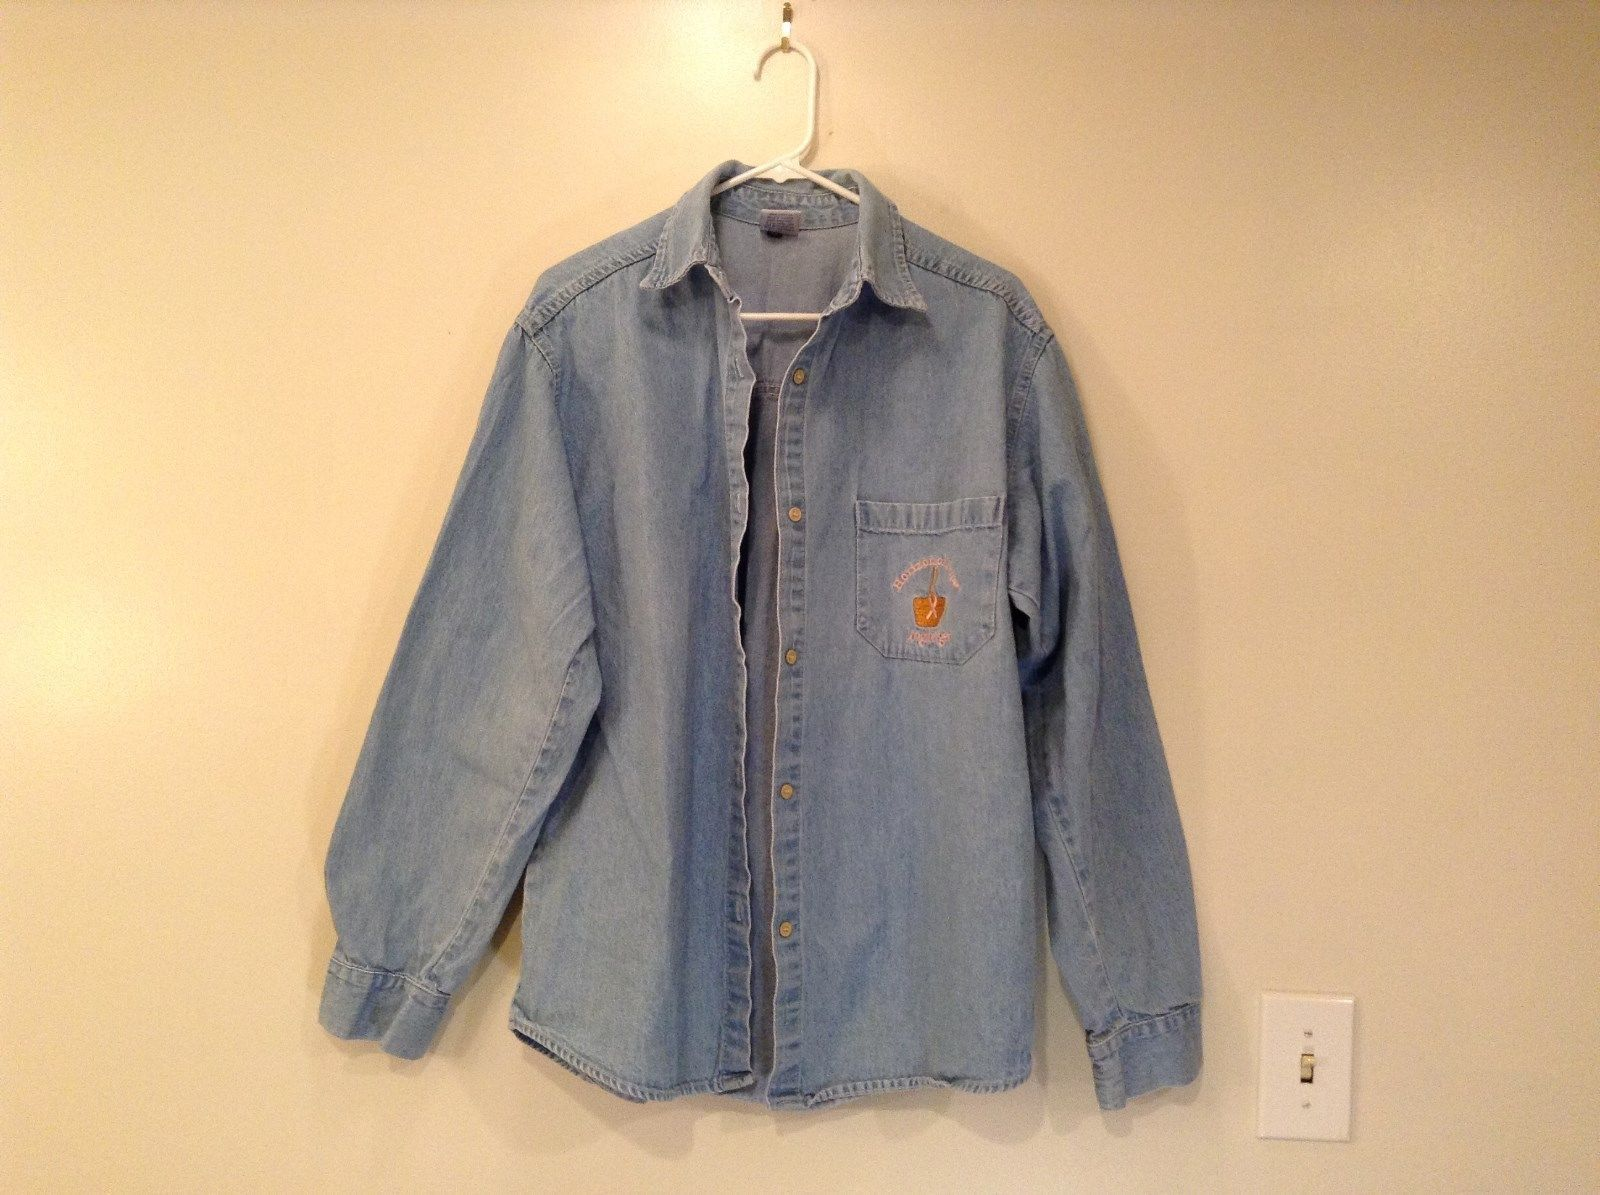 Horizon of Hope Longaberger by Tutti Light Blue Button Up Shirt Size XL